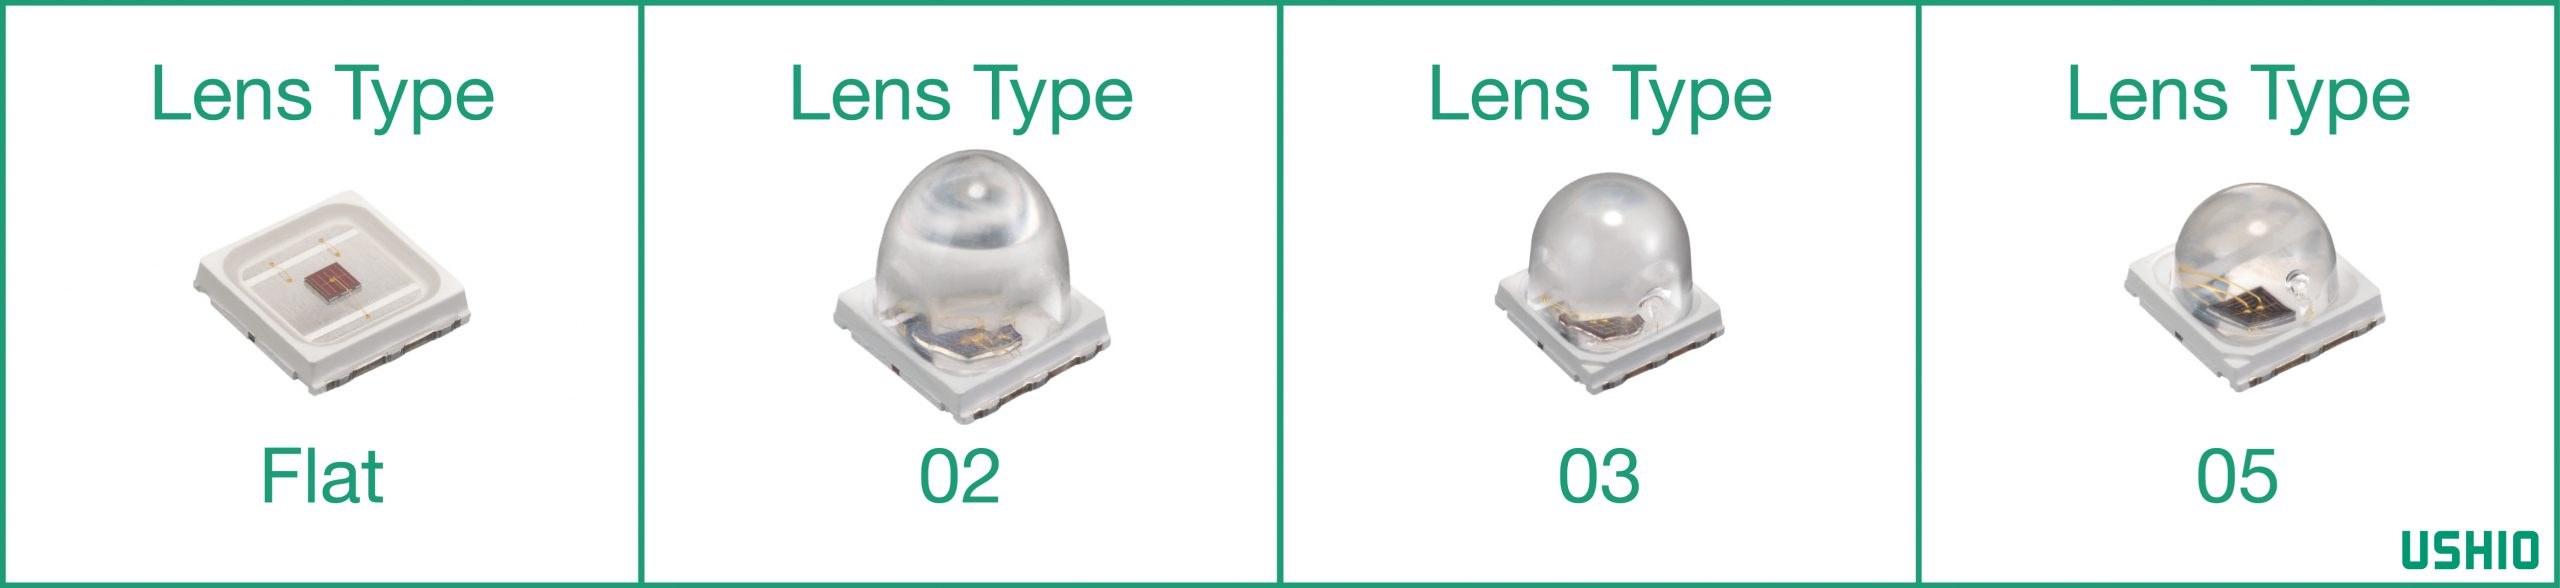 Lens Types - Chips